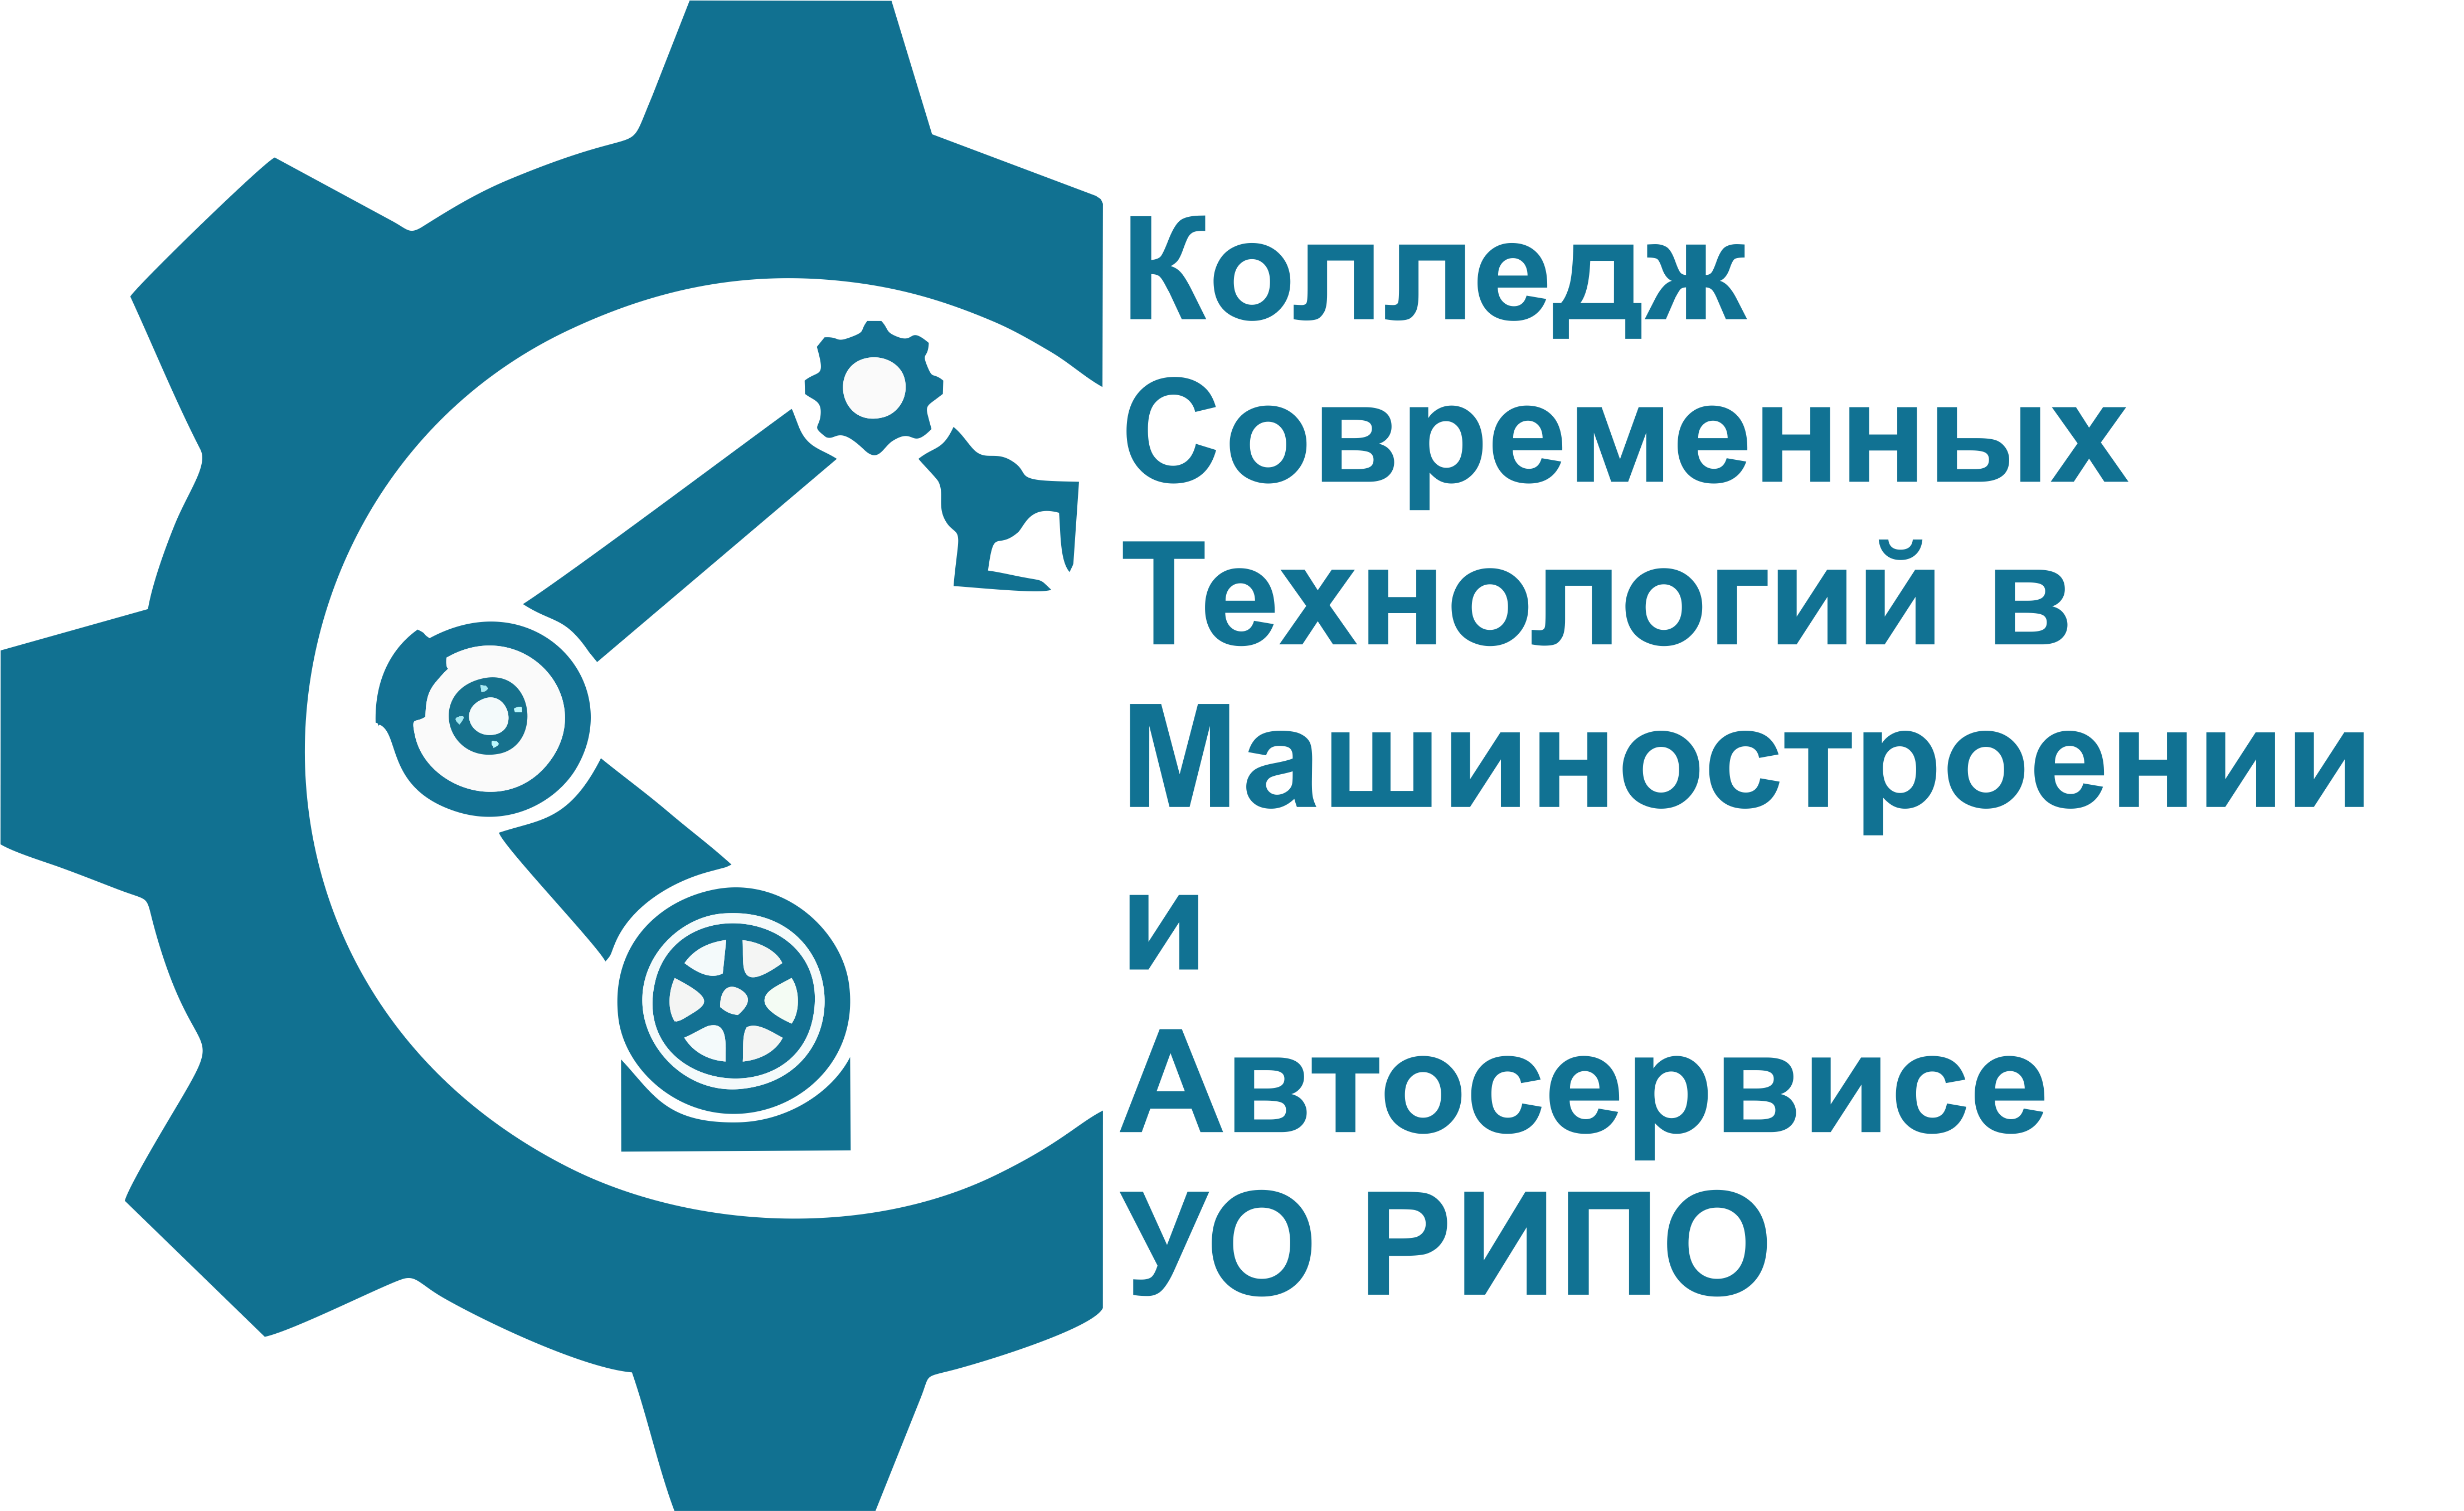 Филиал КСТМиА УО РИПО